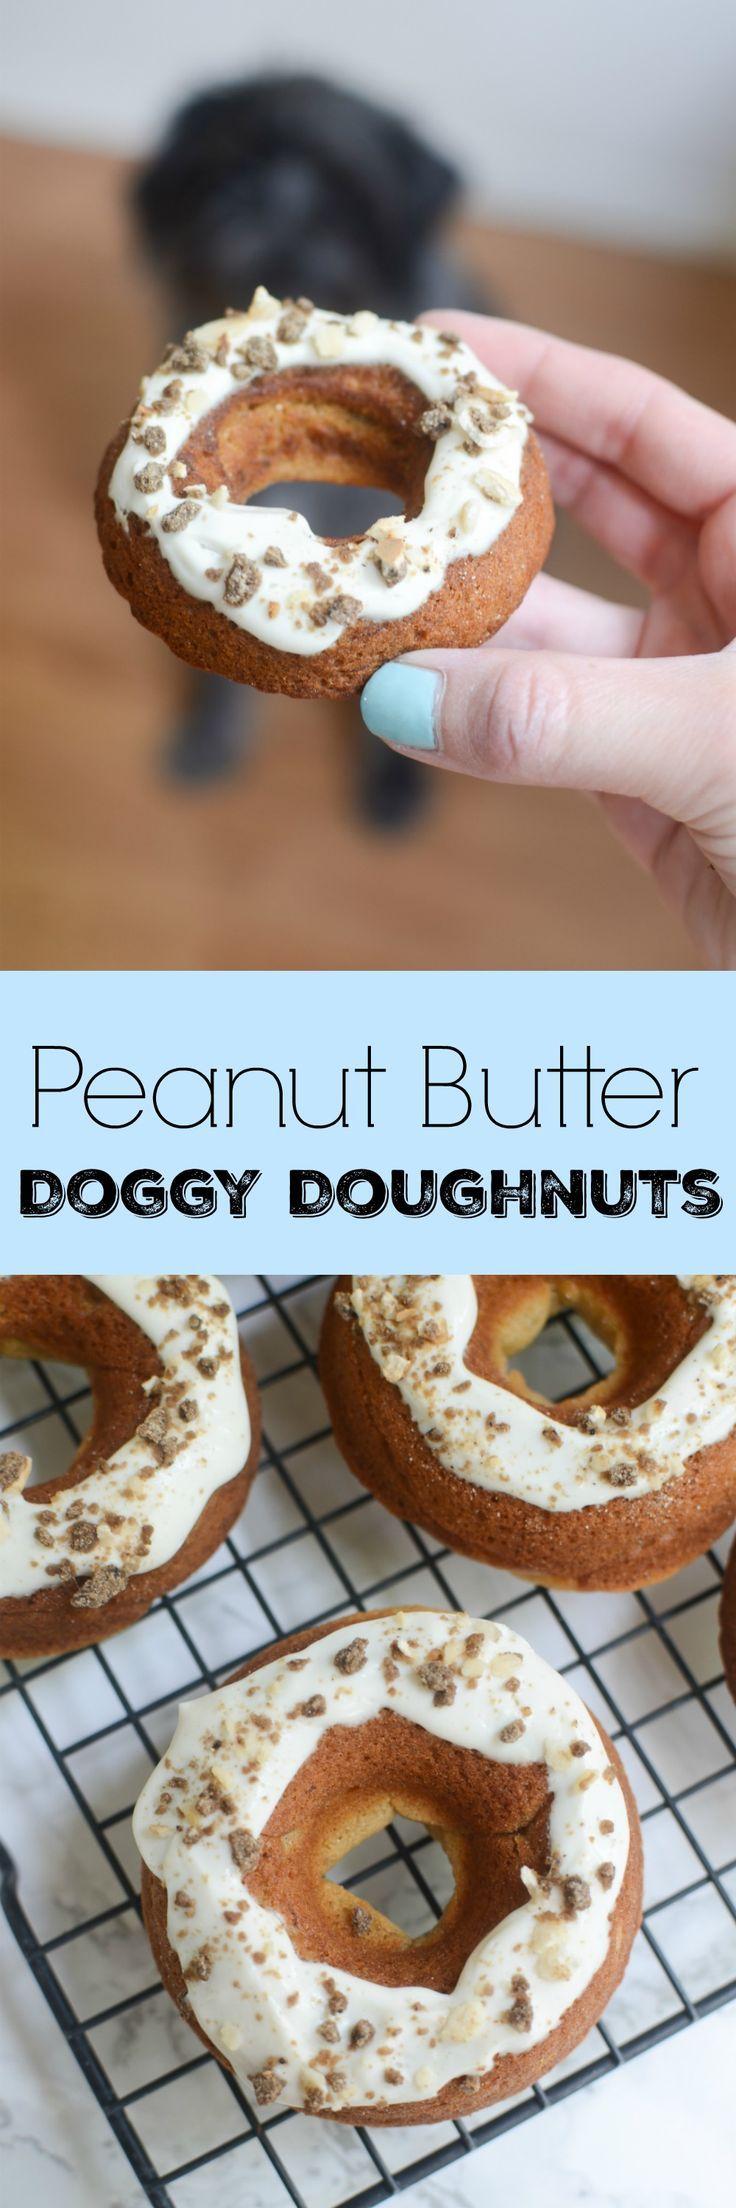 Peanut Butter Dog Doughnuts - treat your pup to a homemade doughnut!